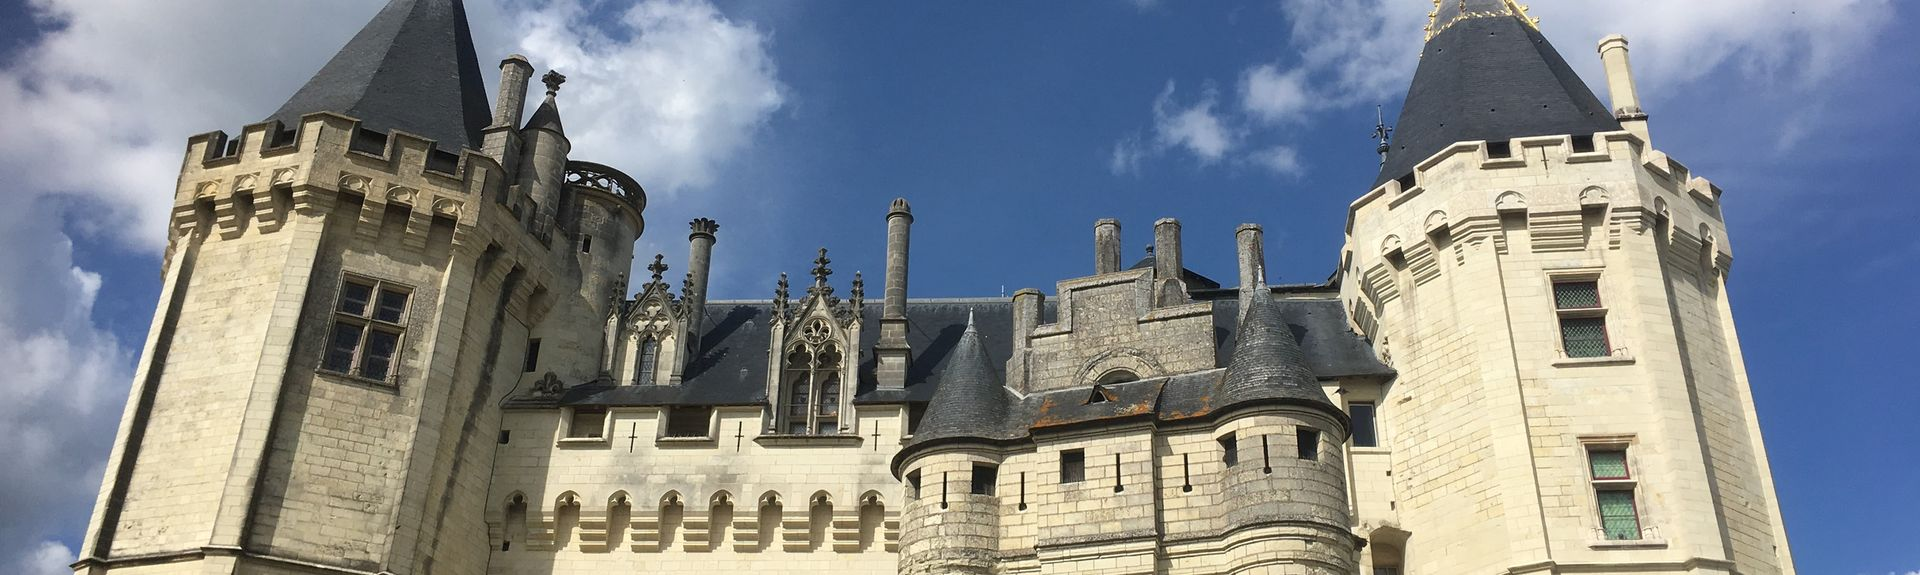 Savigny-en-Veron, Indre-et-Loire (διαμέρισμα), Γαλλία